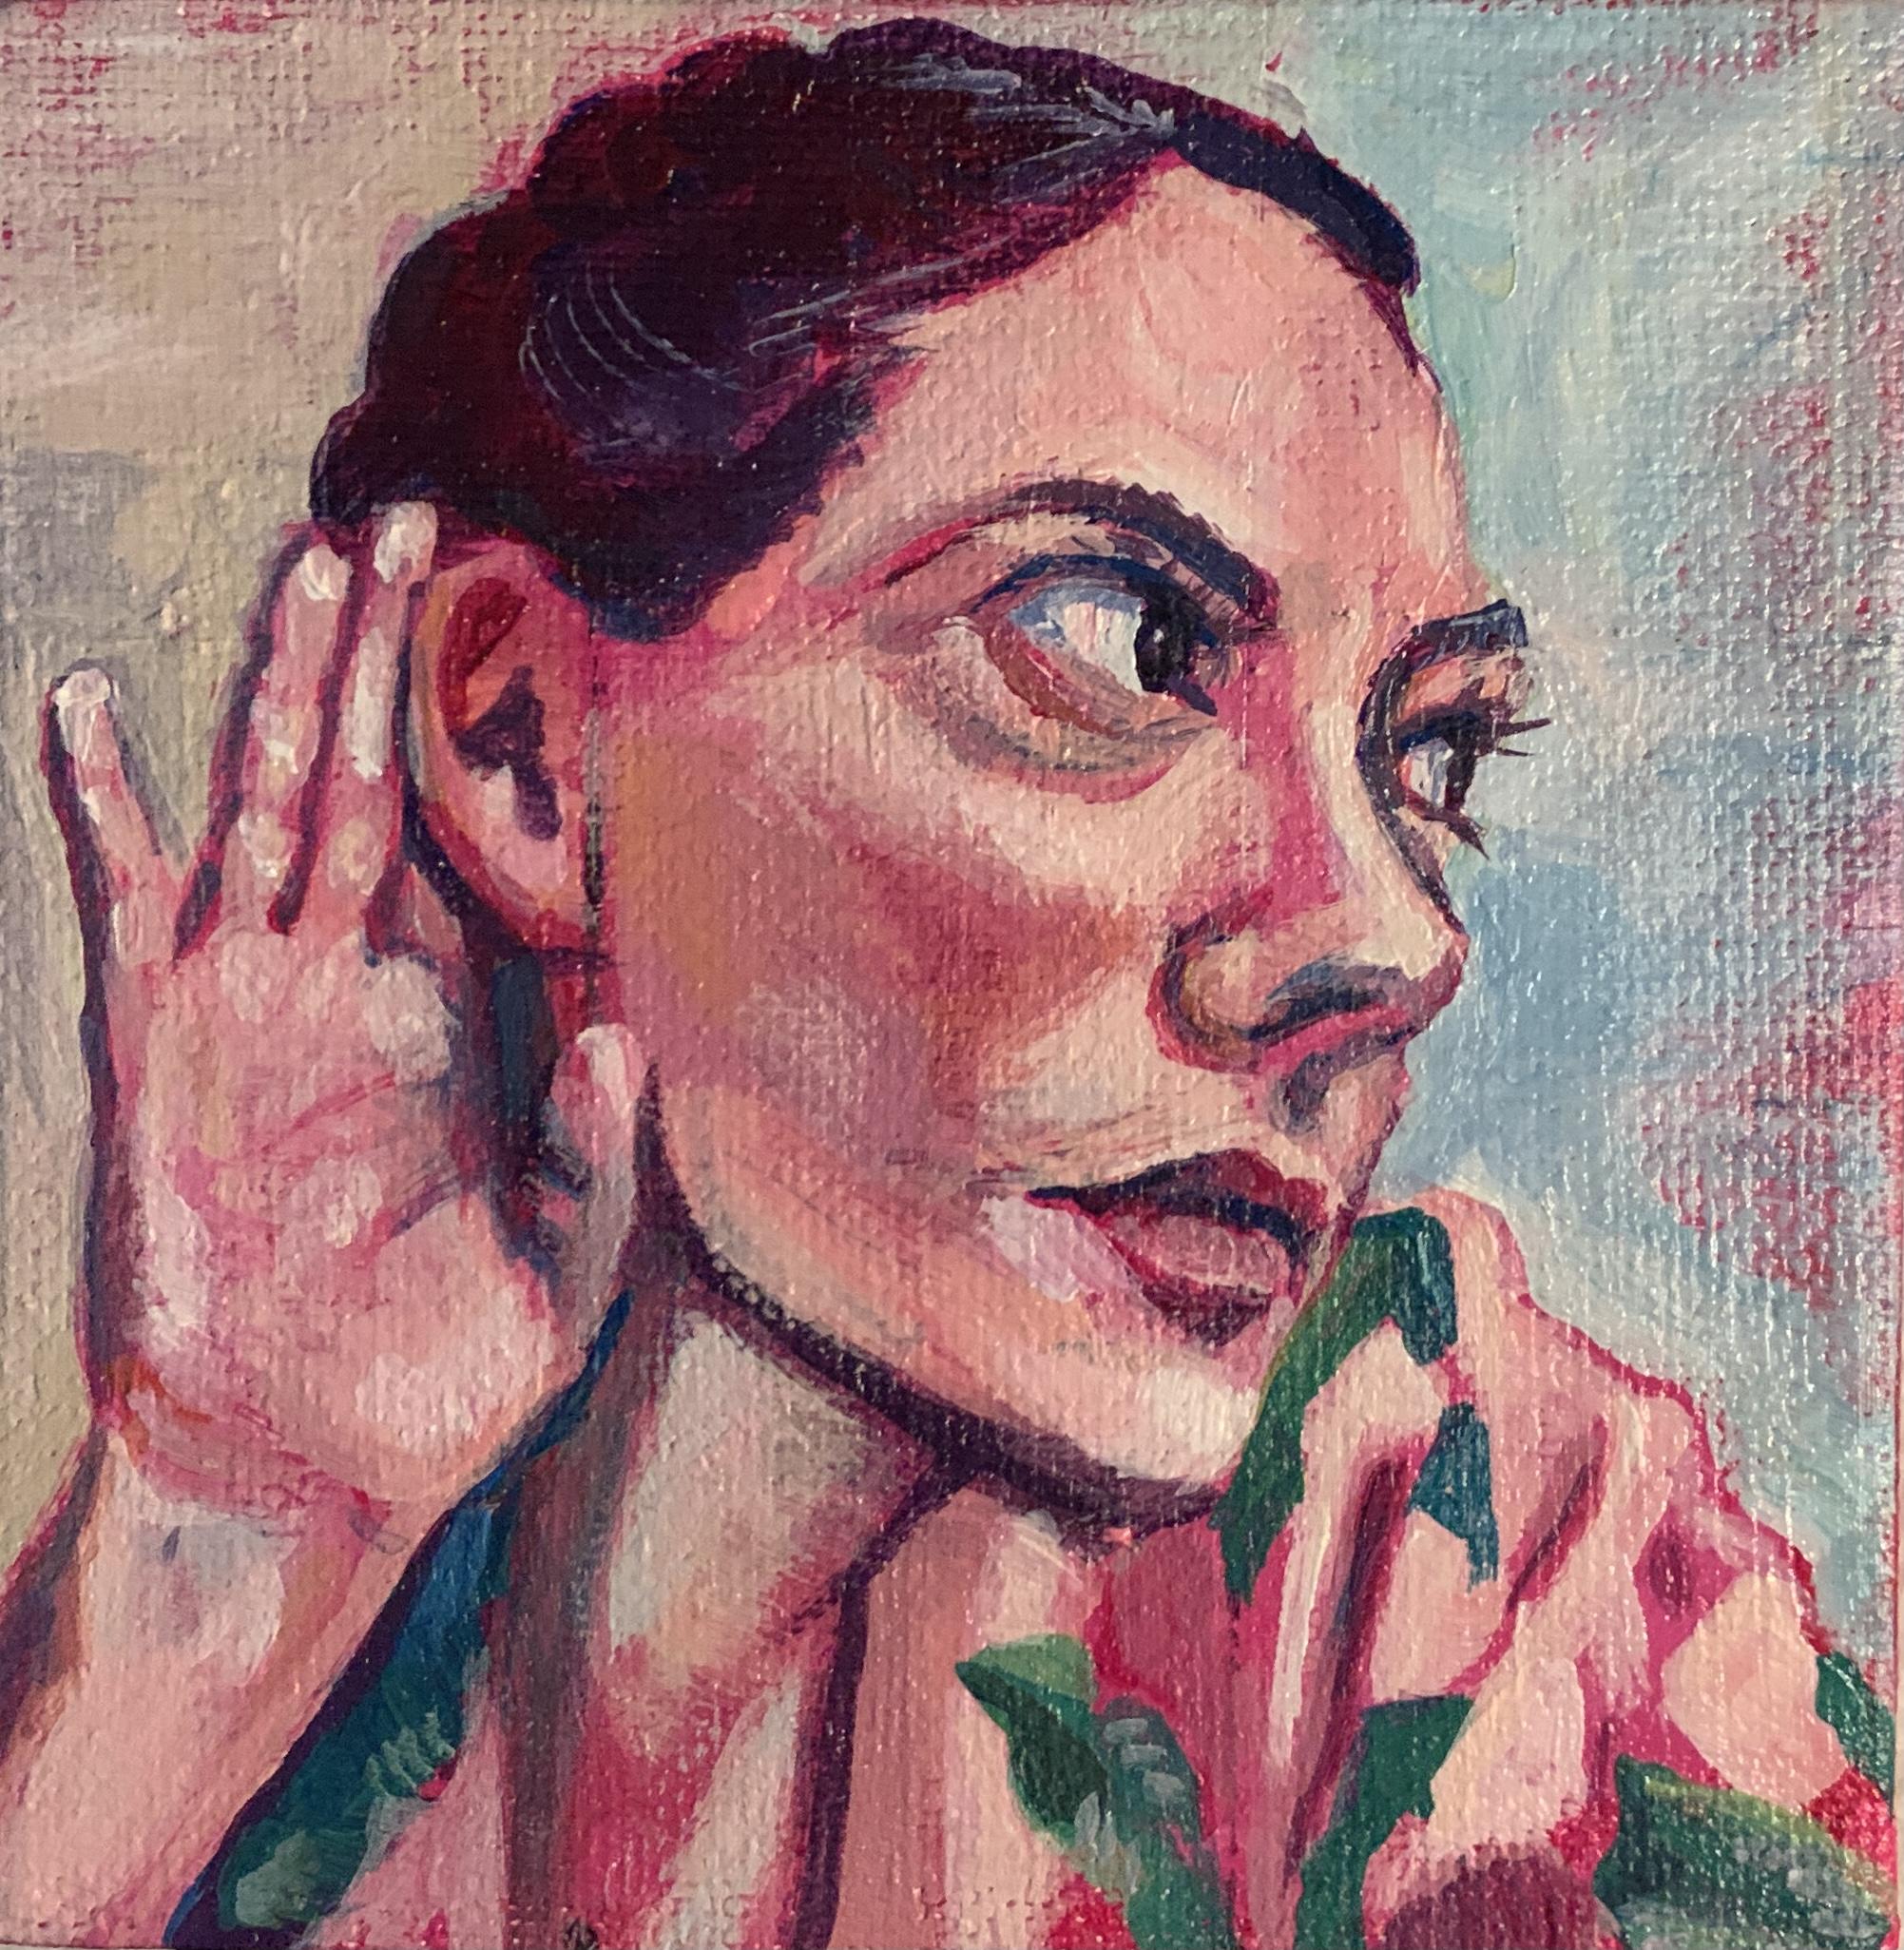 SELF PORTRAIT, THE HEARKENER by STEPHANIE SHERMAN